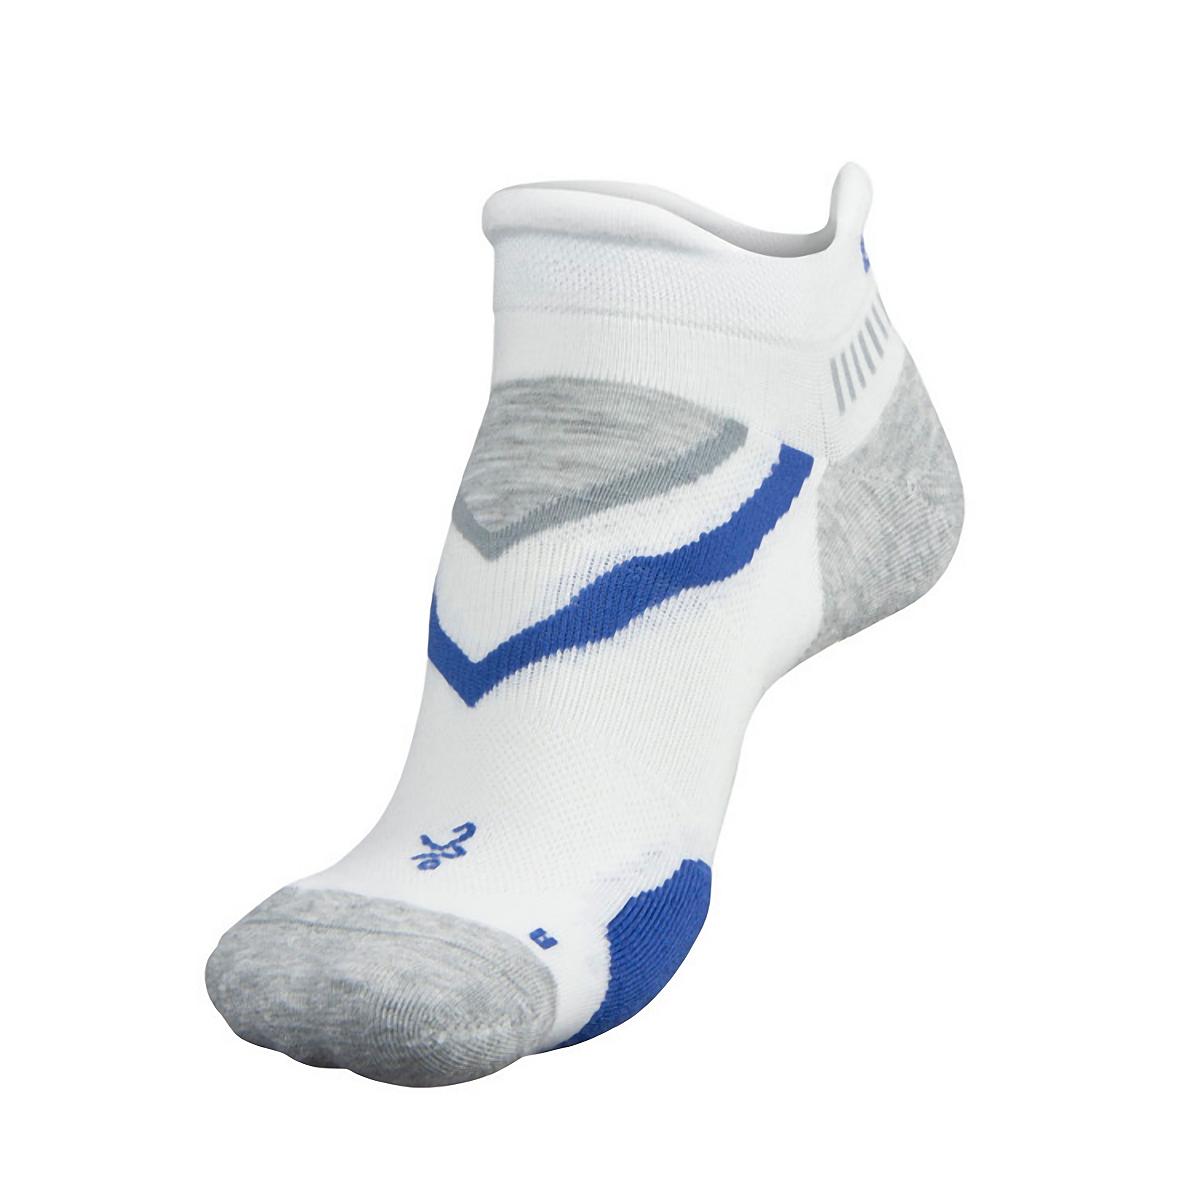 Balega UltraGlide No Show Socks - Color: White - Size: S, White, large, image 2